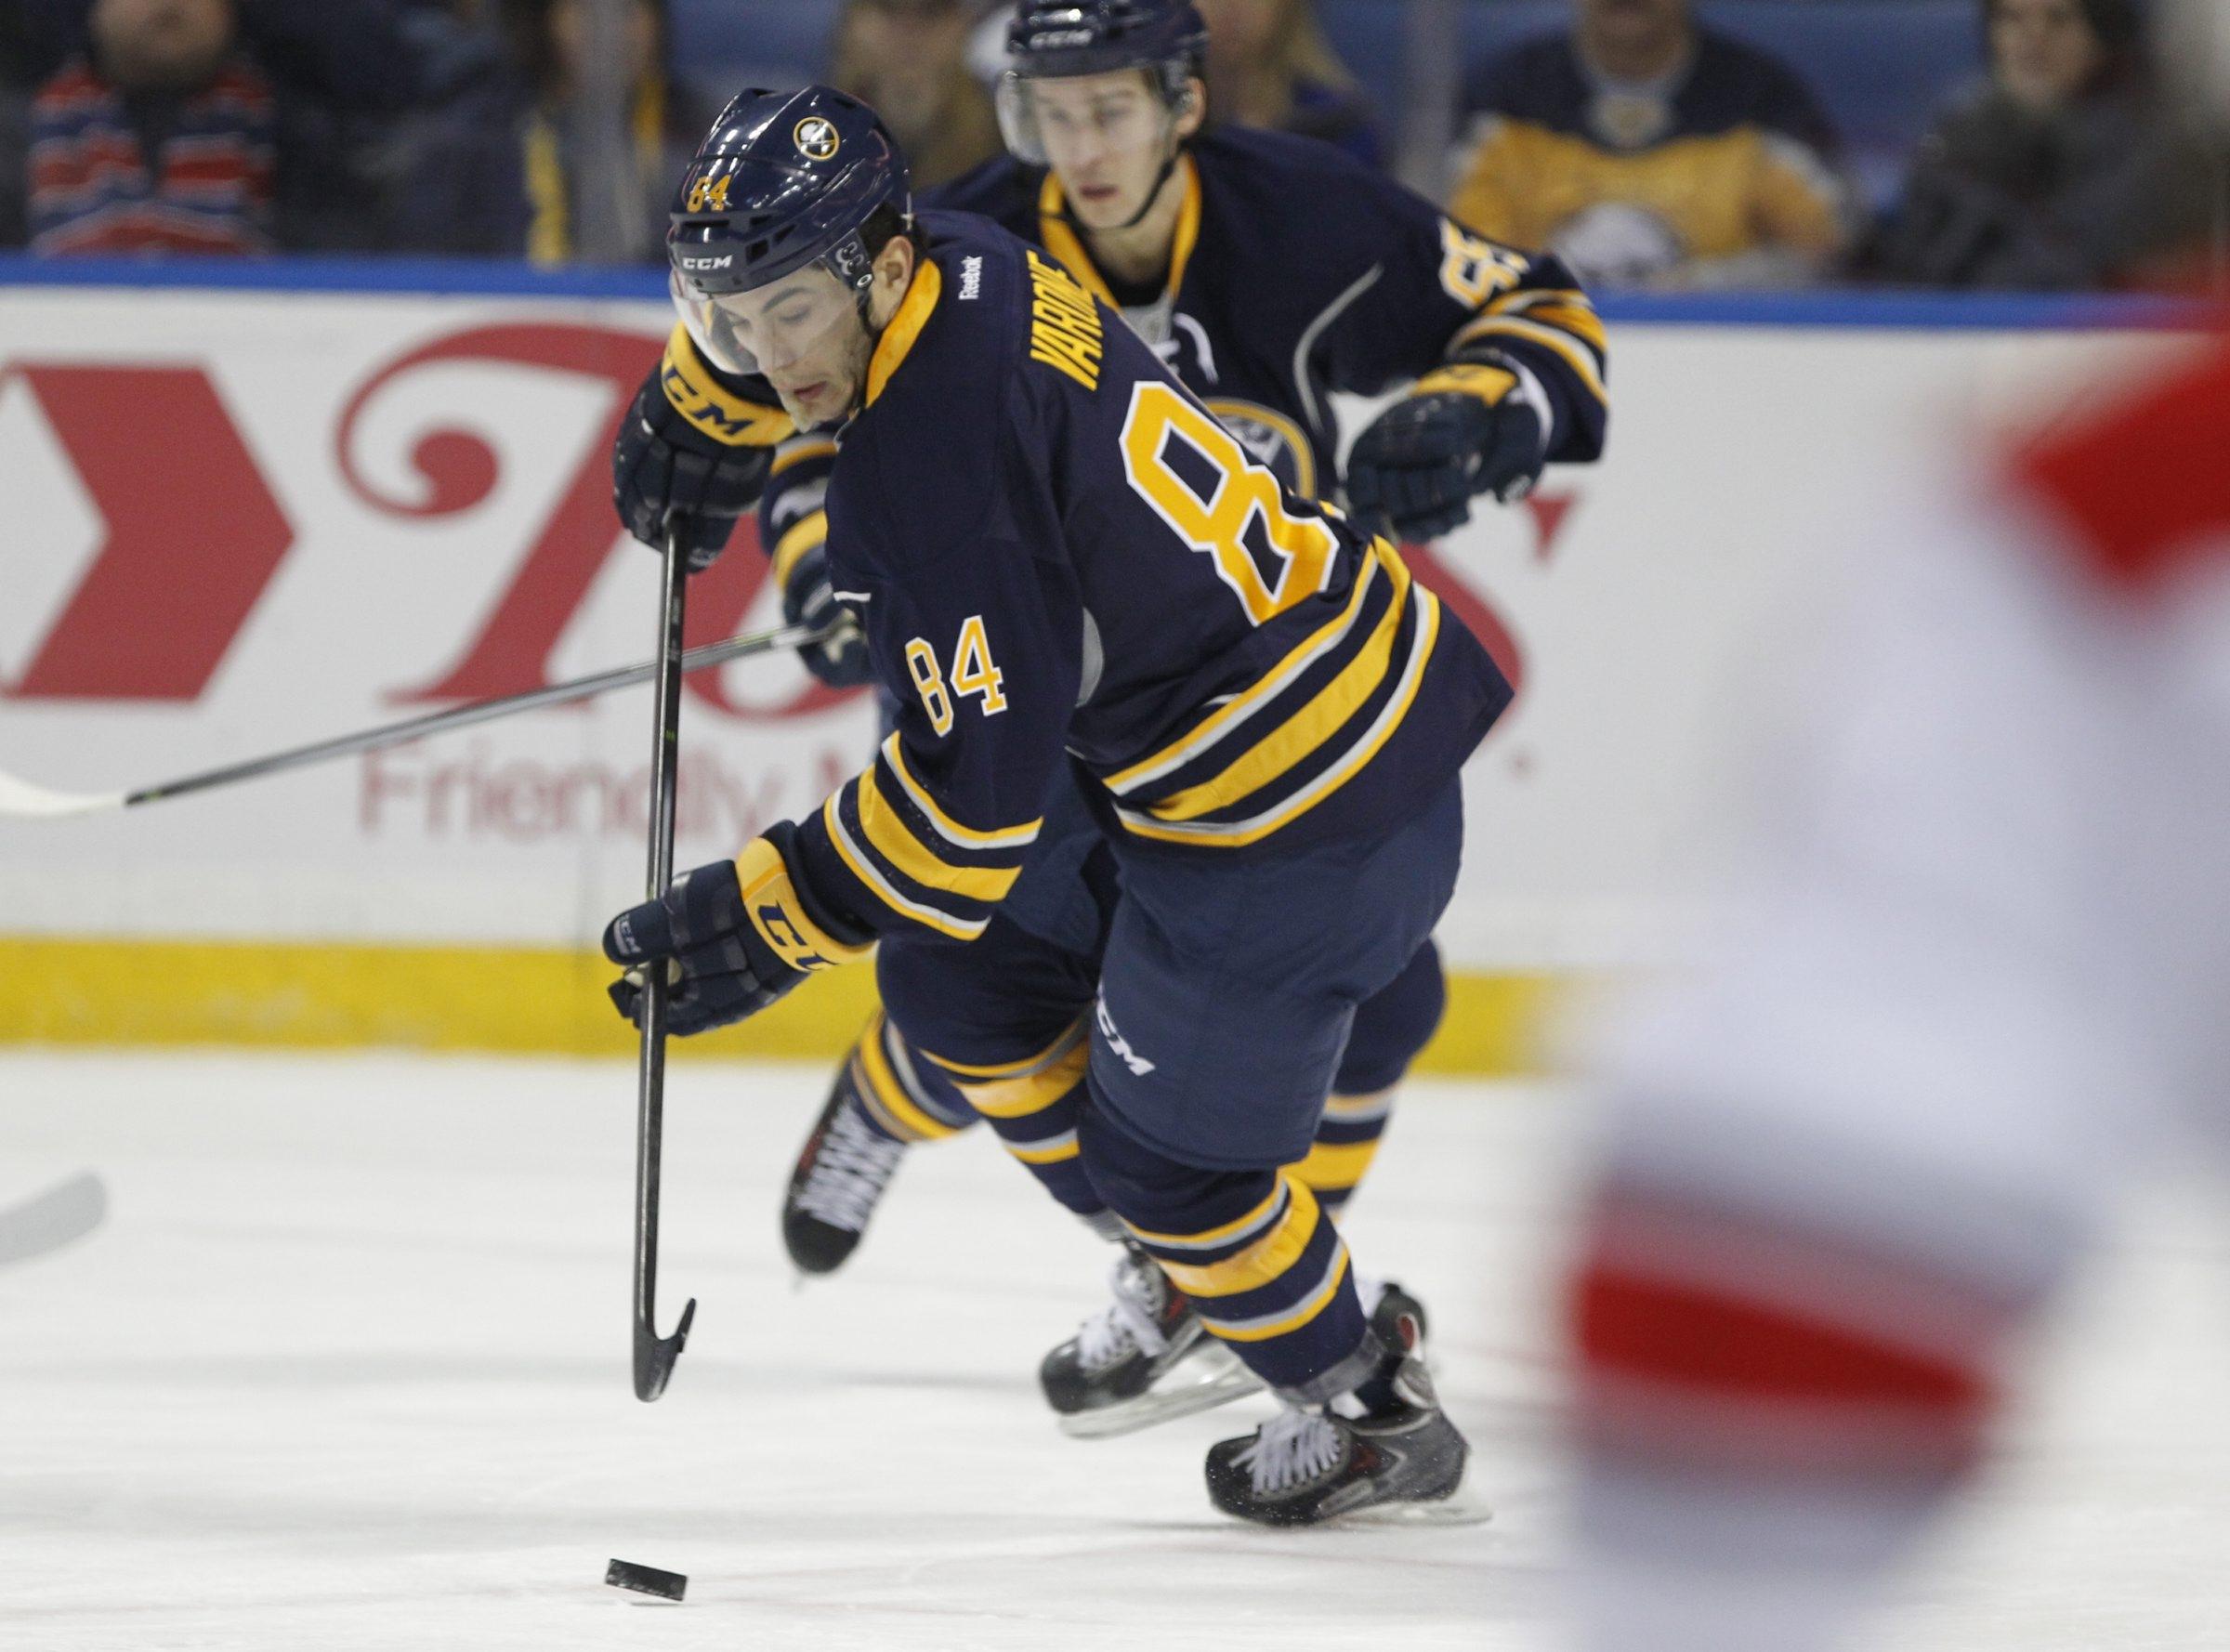 Phil Varone makes his NHL debut at First Niagara Center on Thursday against Carolina.